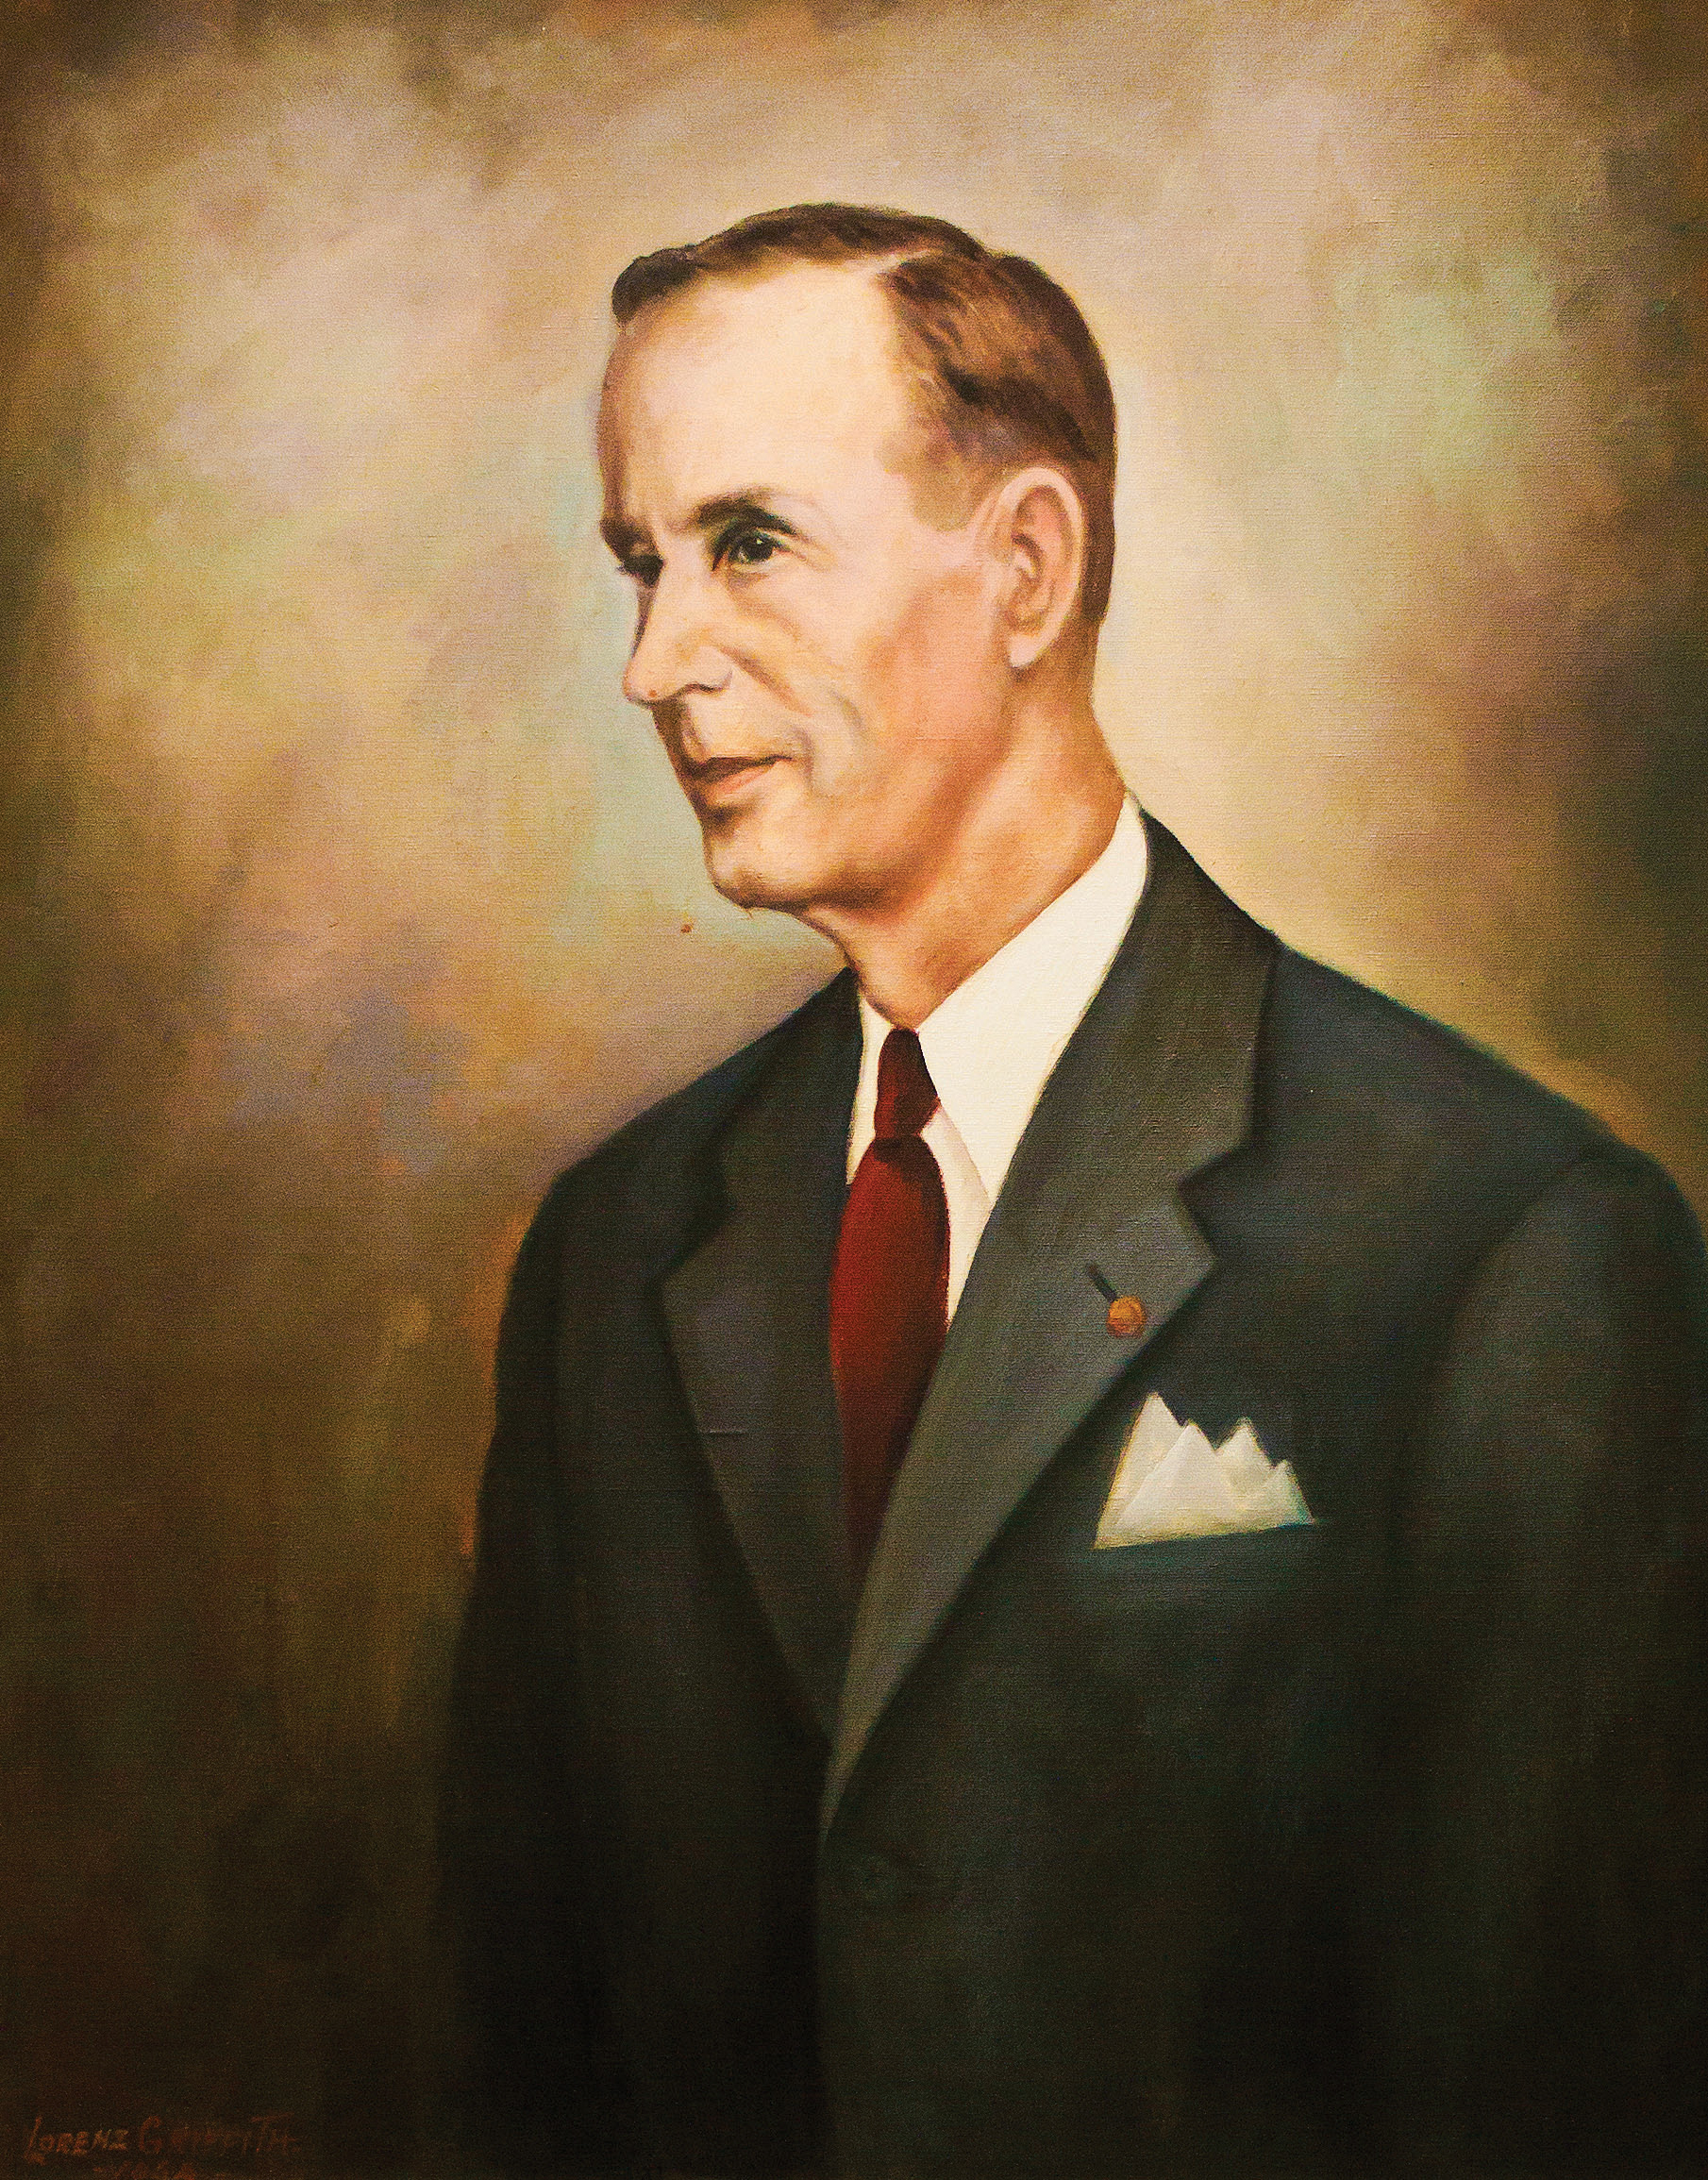 Thomas Bryant Buck 1890-1948